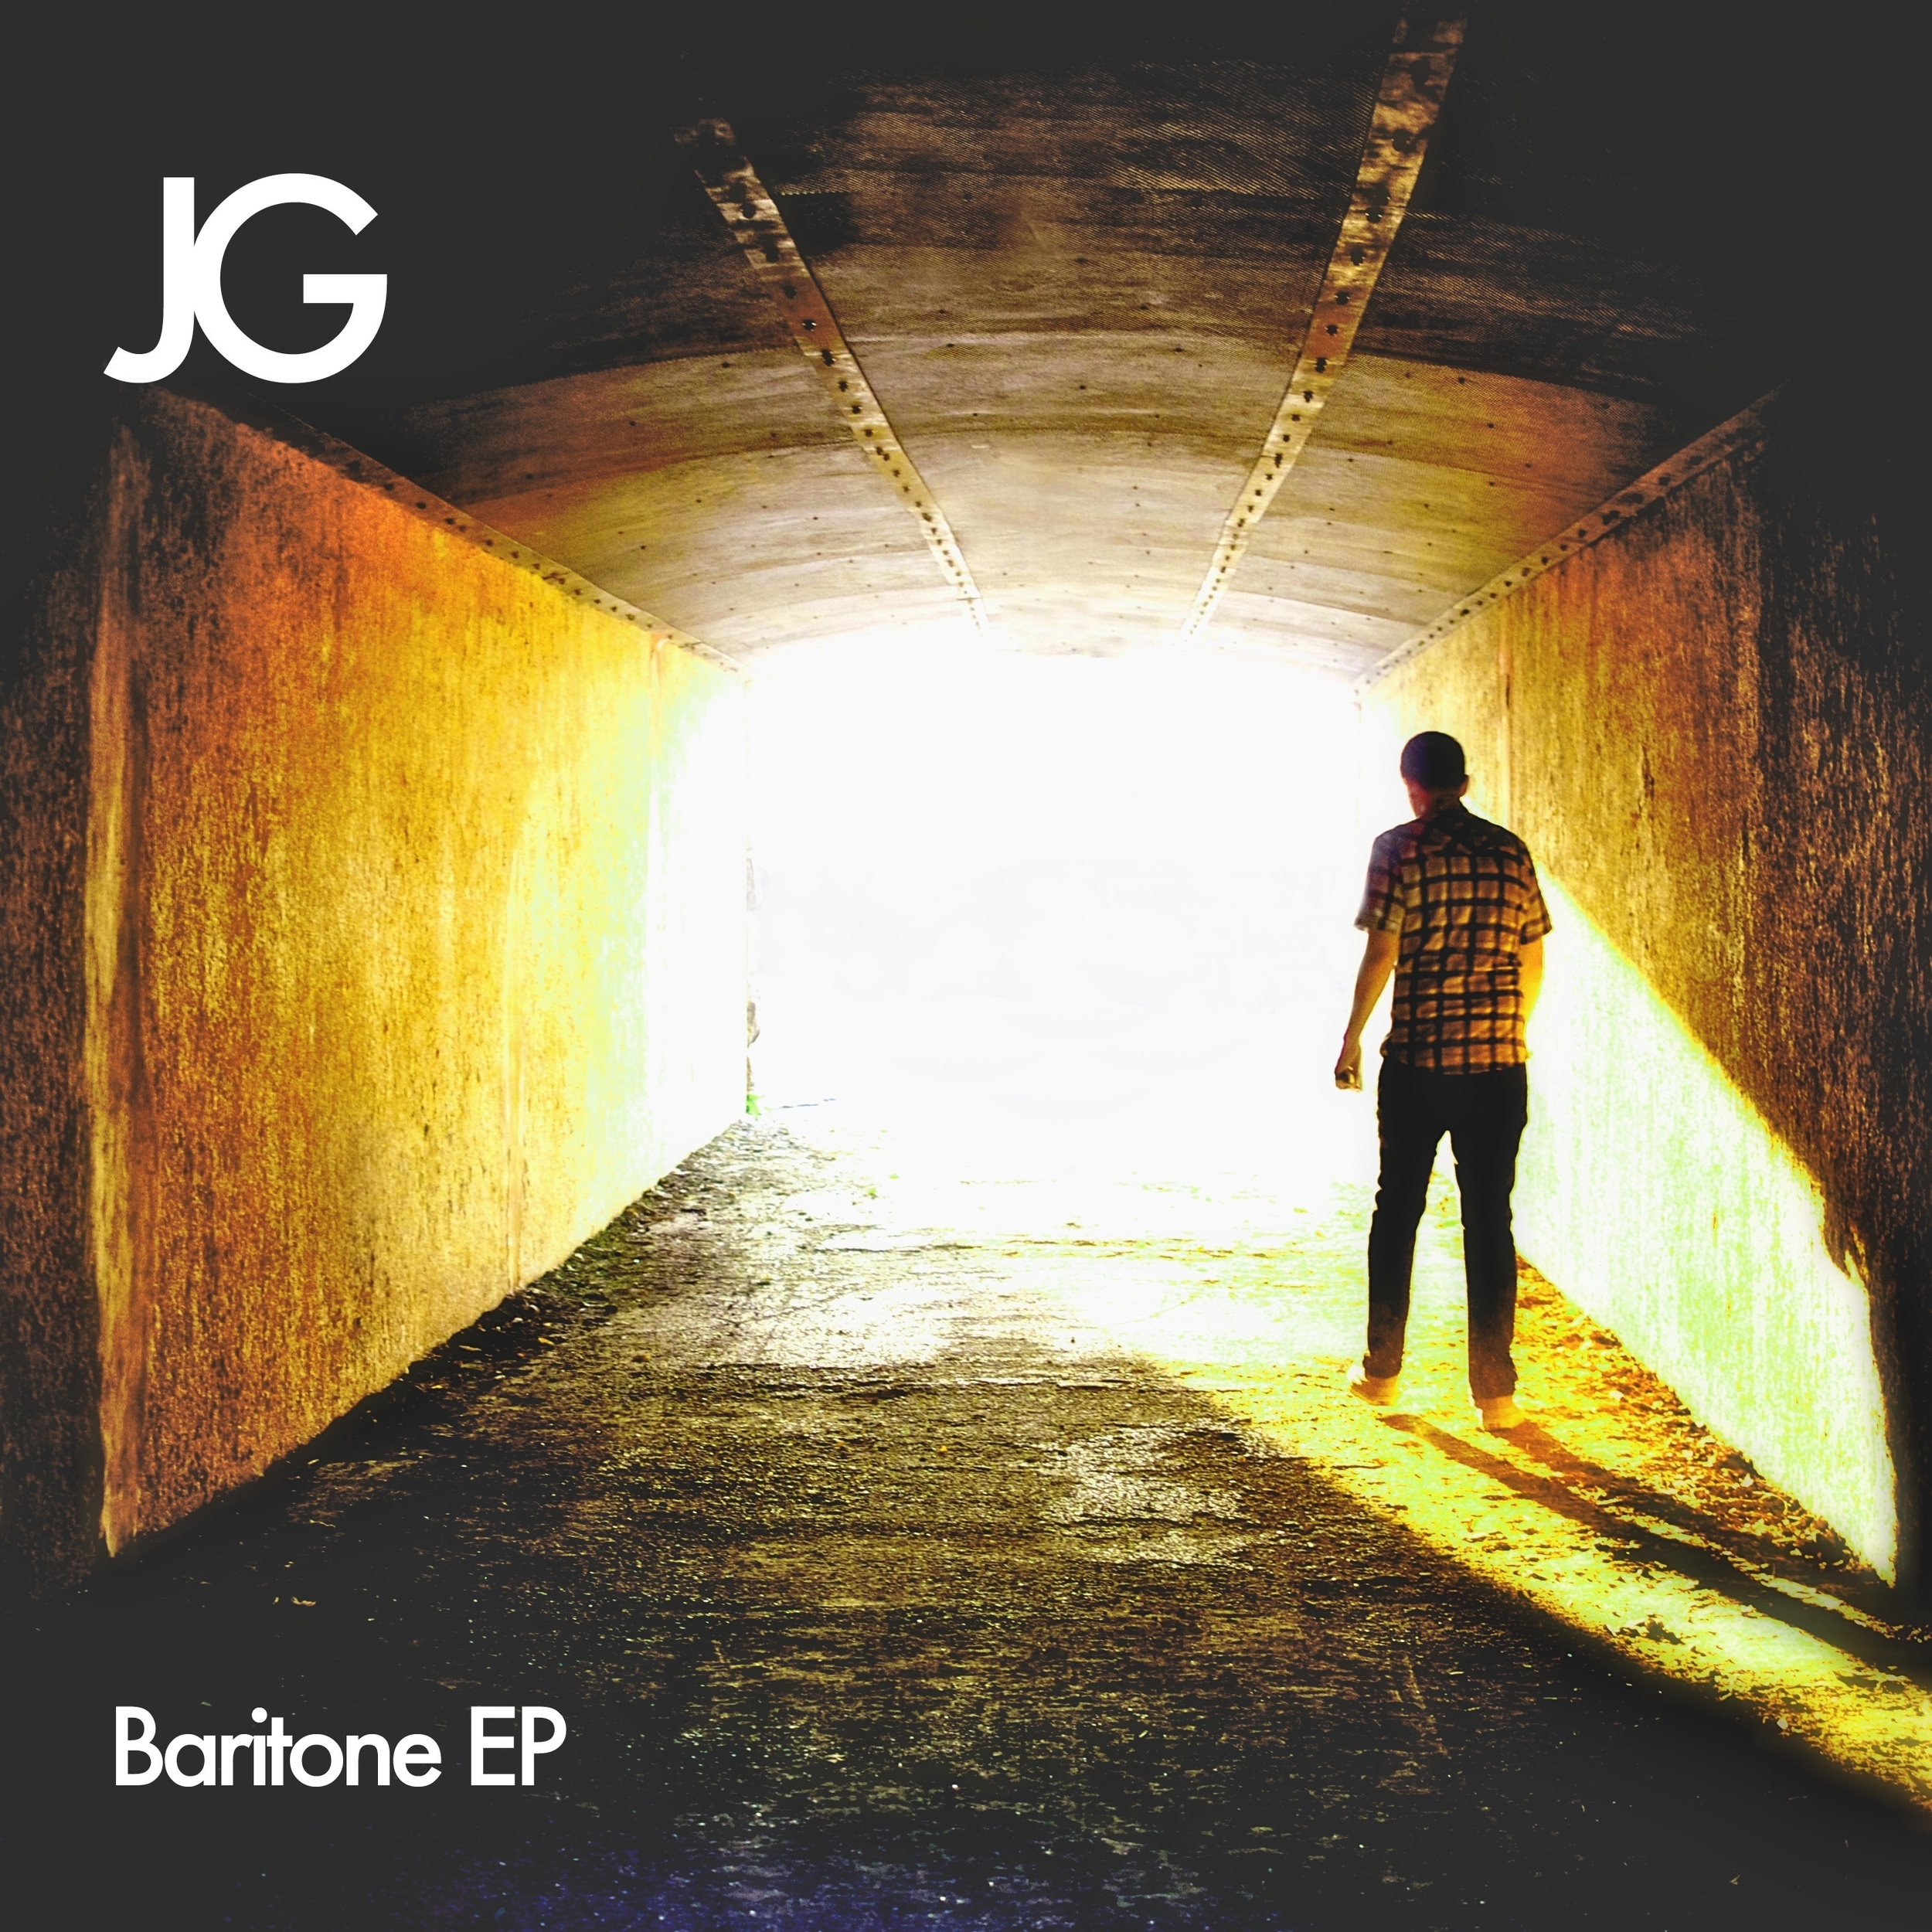 JG Baritone EP Front Cover.jpg